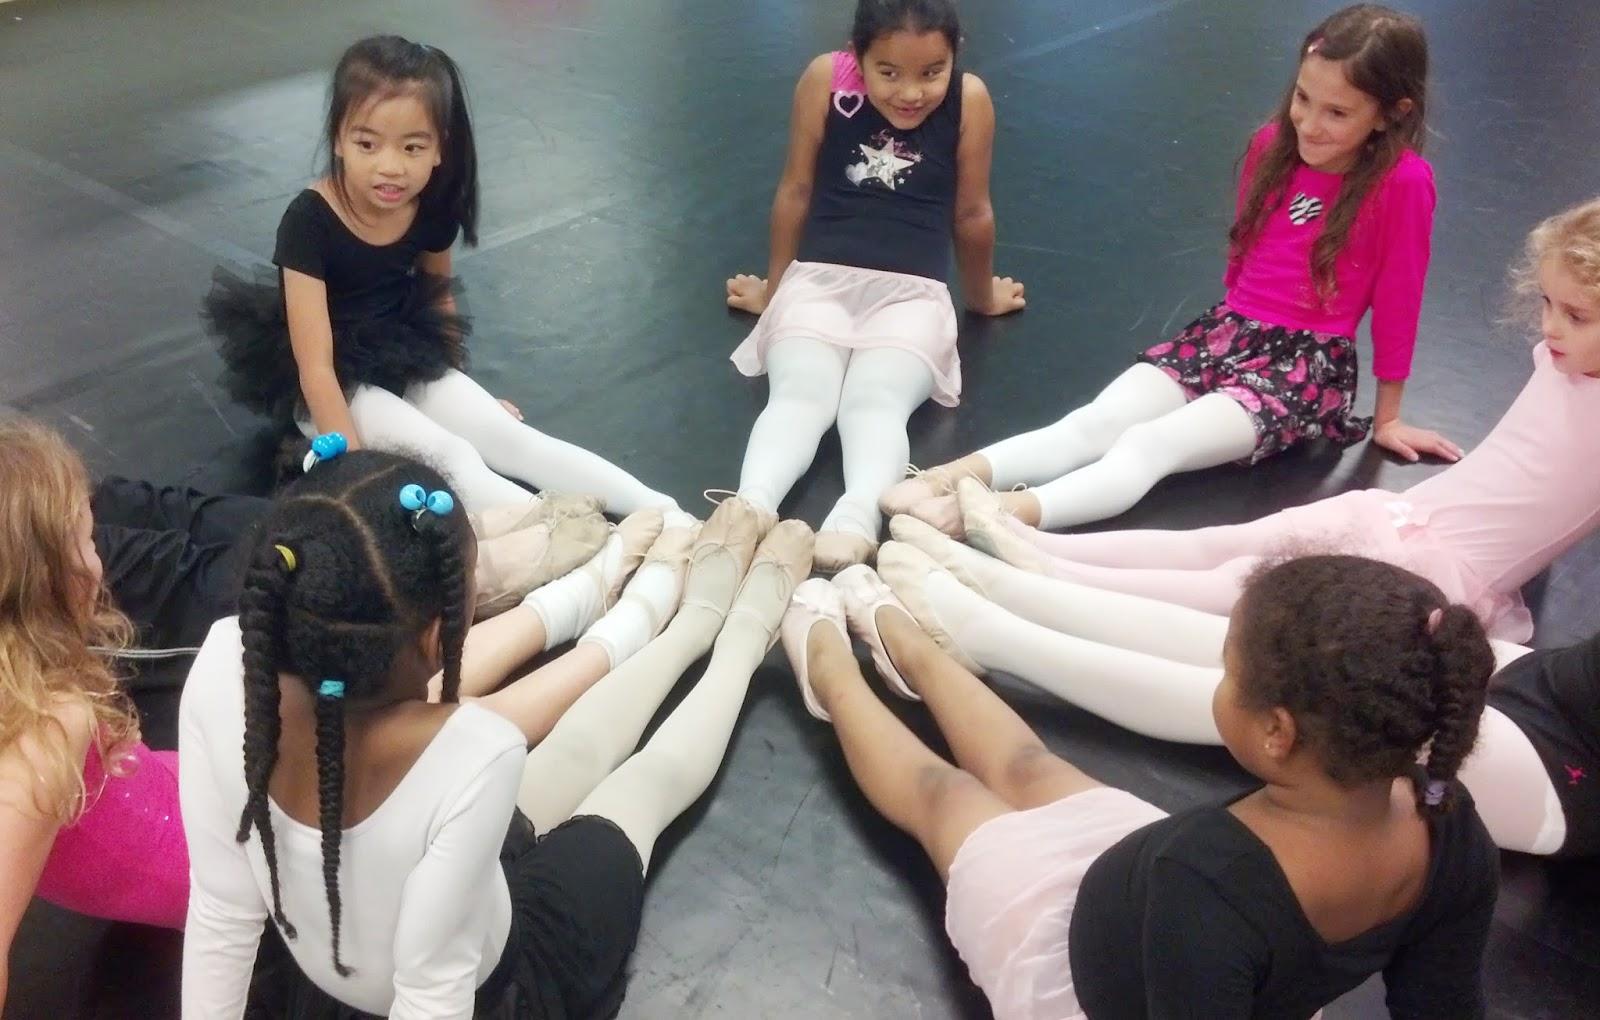 dance lessons charlotte children